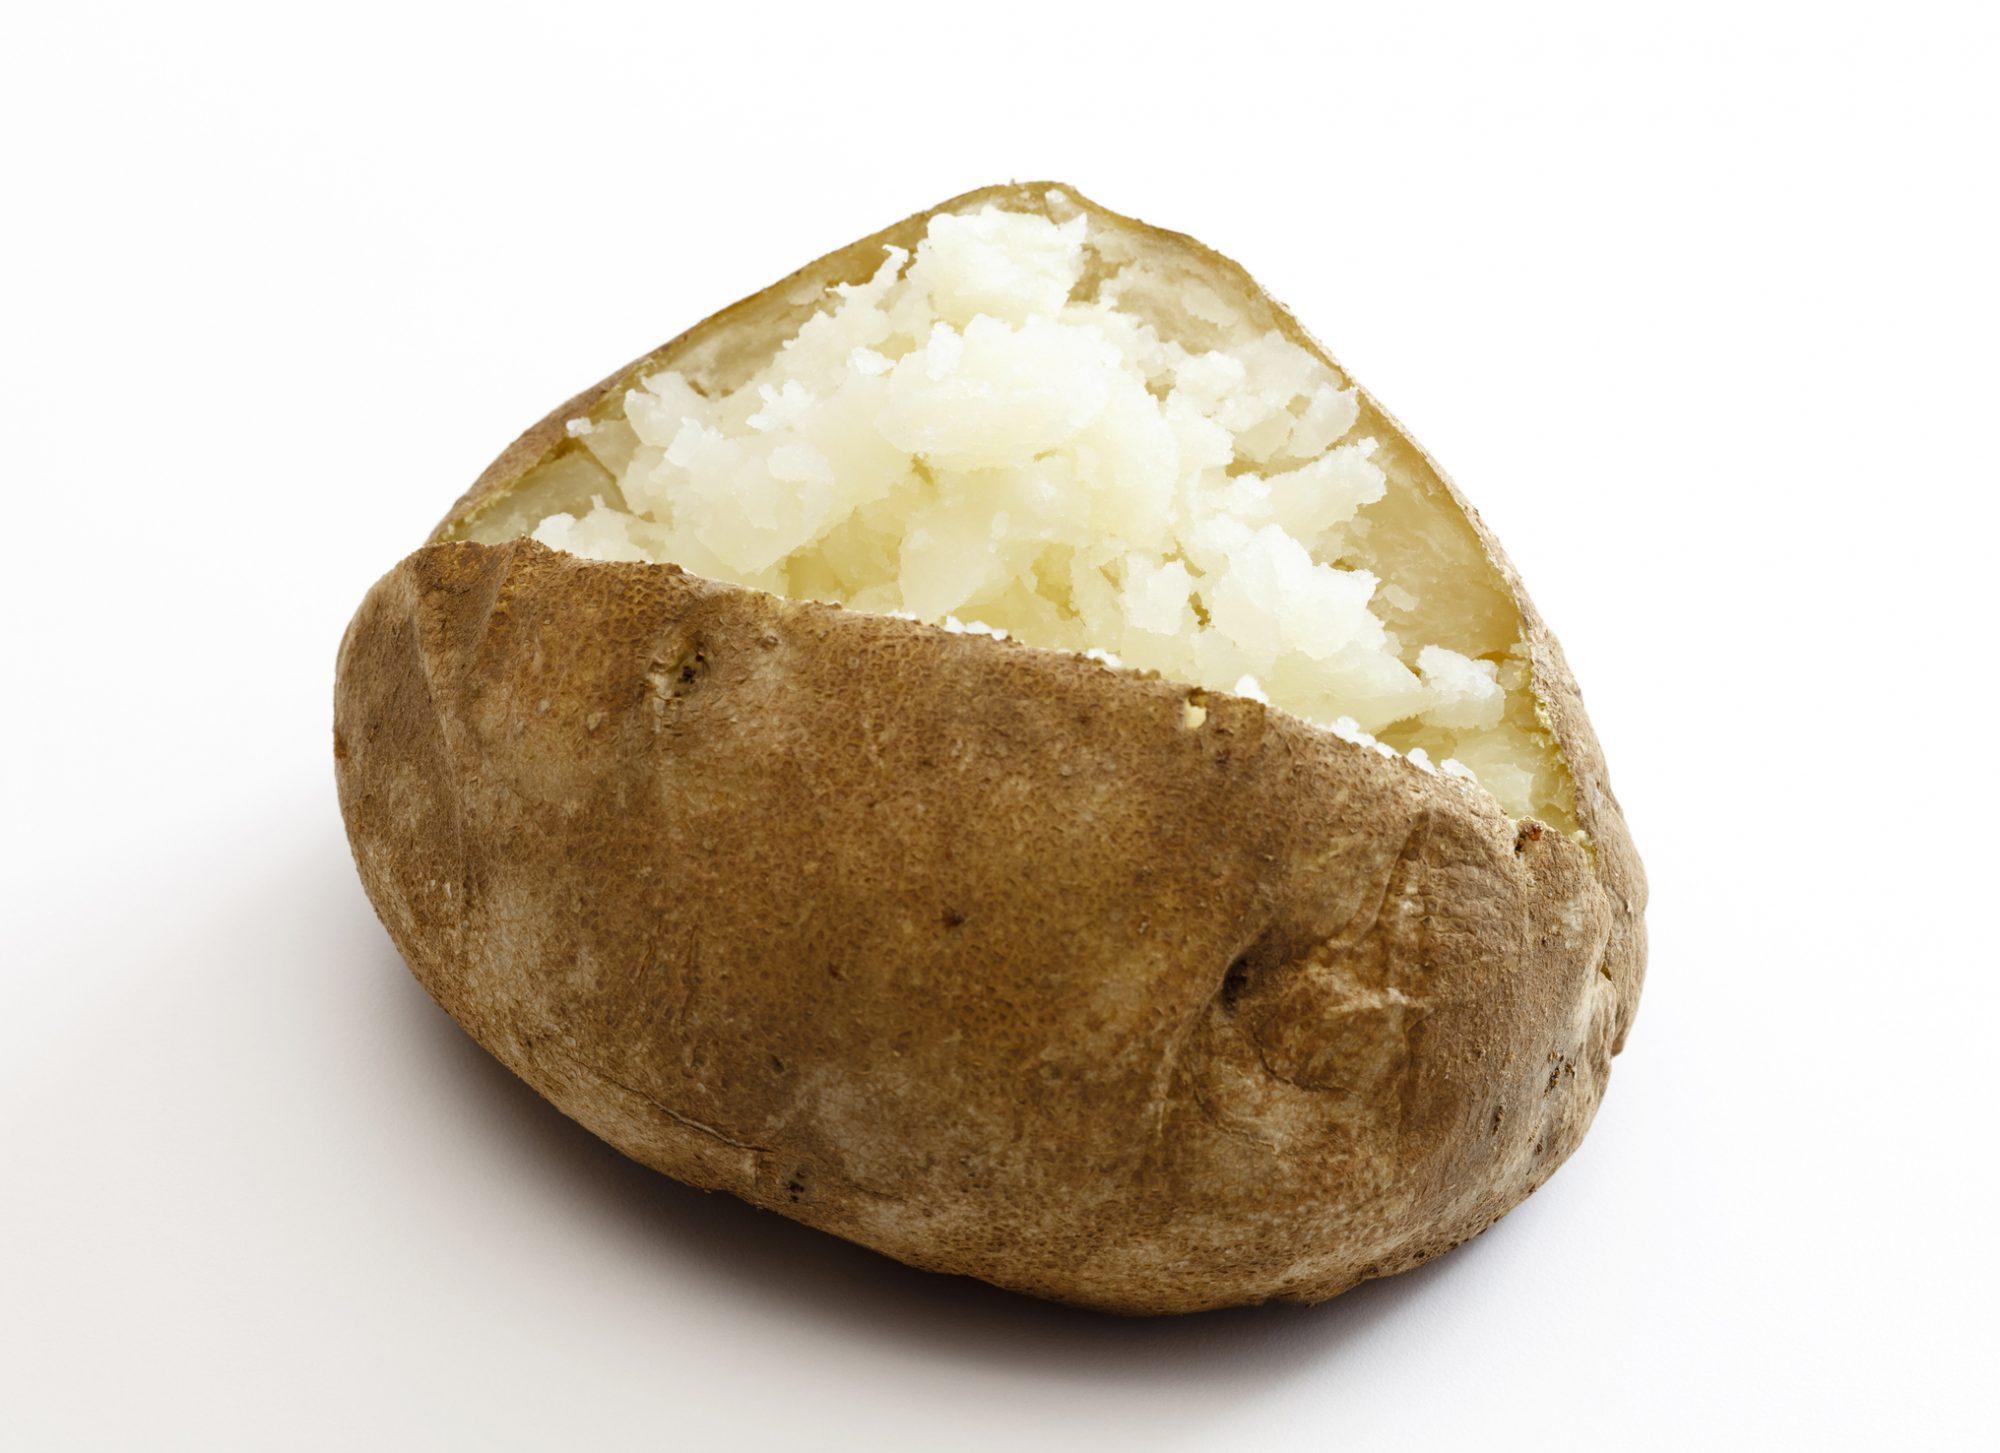 getty-baked-potato-image